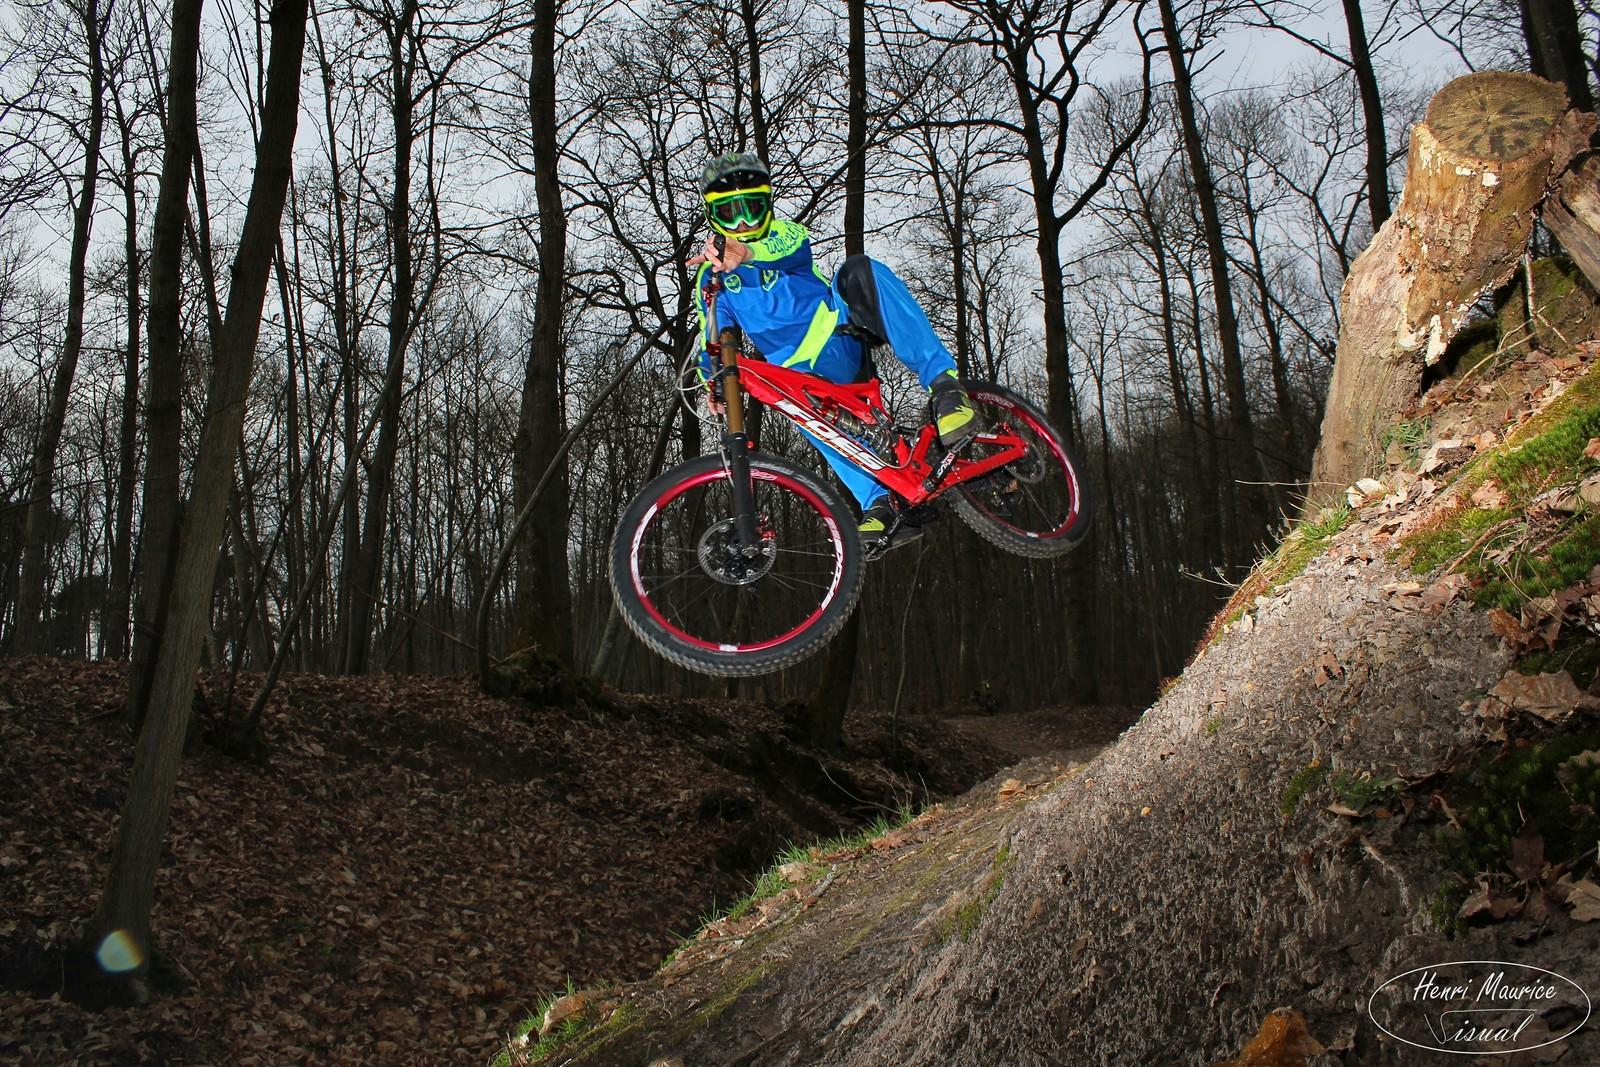 Whip Frog - HenriMaurice - Mountain Biking Pictures - Vital MTB